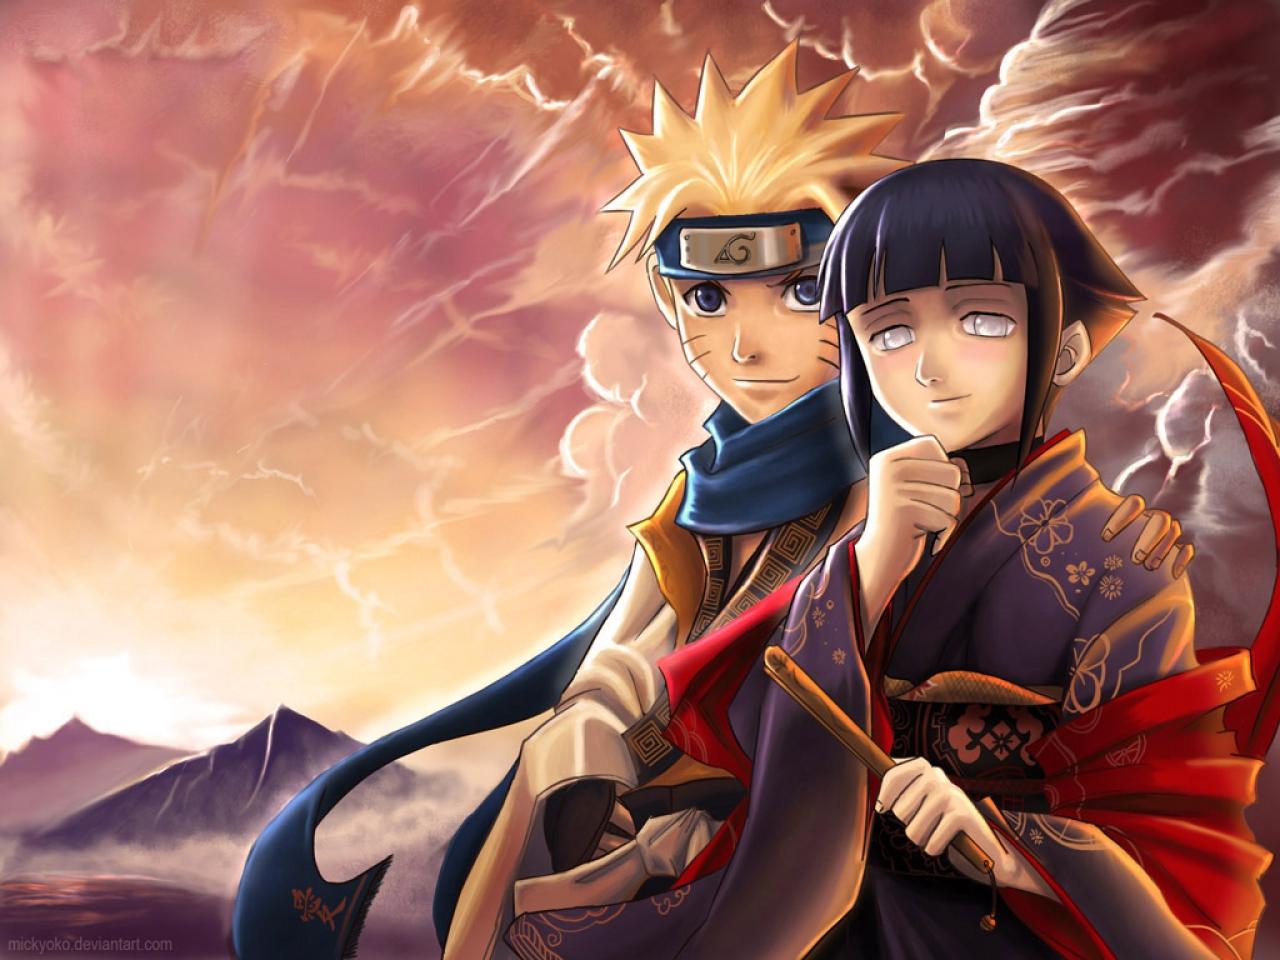 Wallpaper Naruto Terbaru Keren Hd Koleksi Gambar Hd